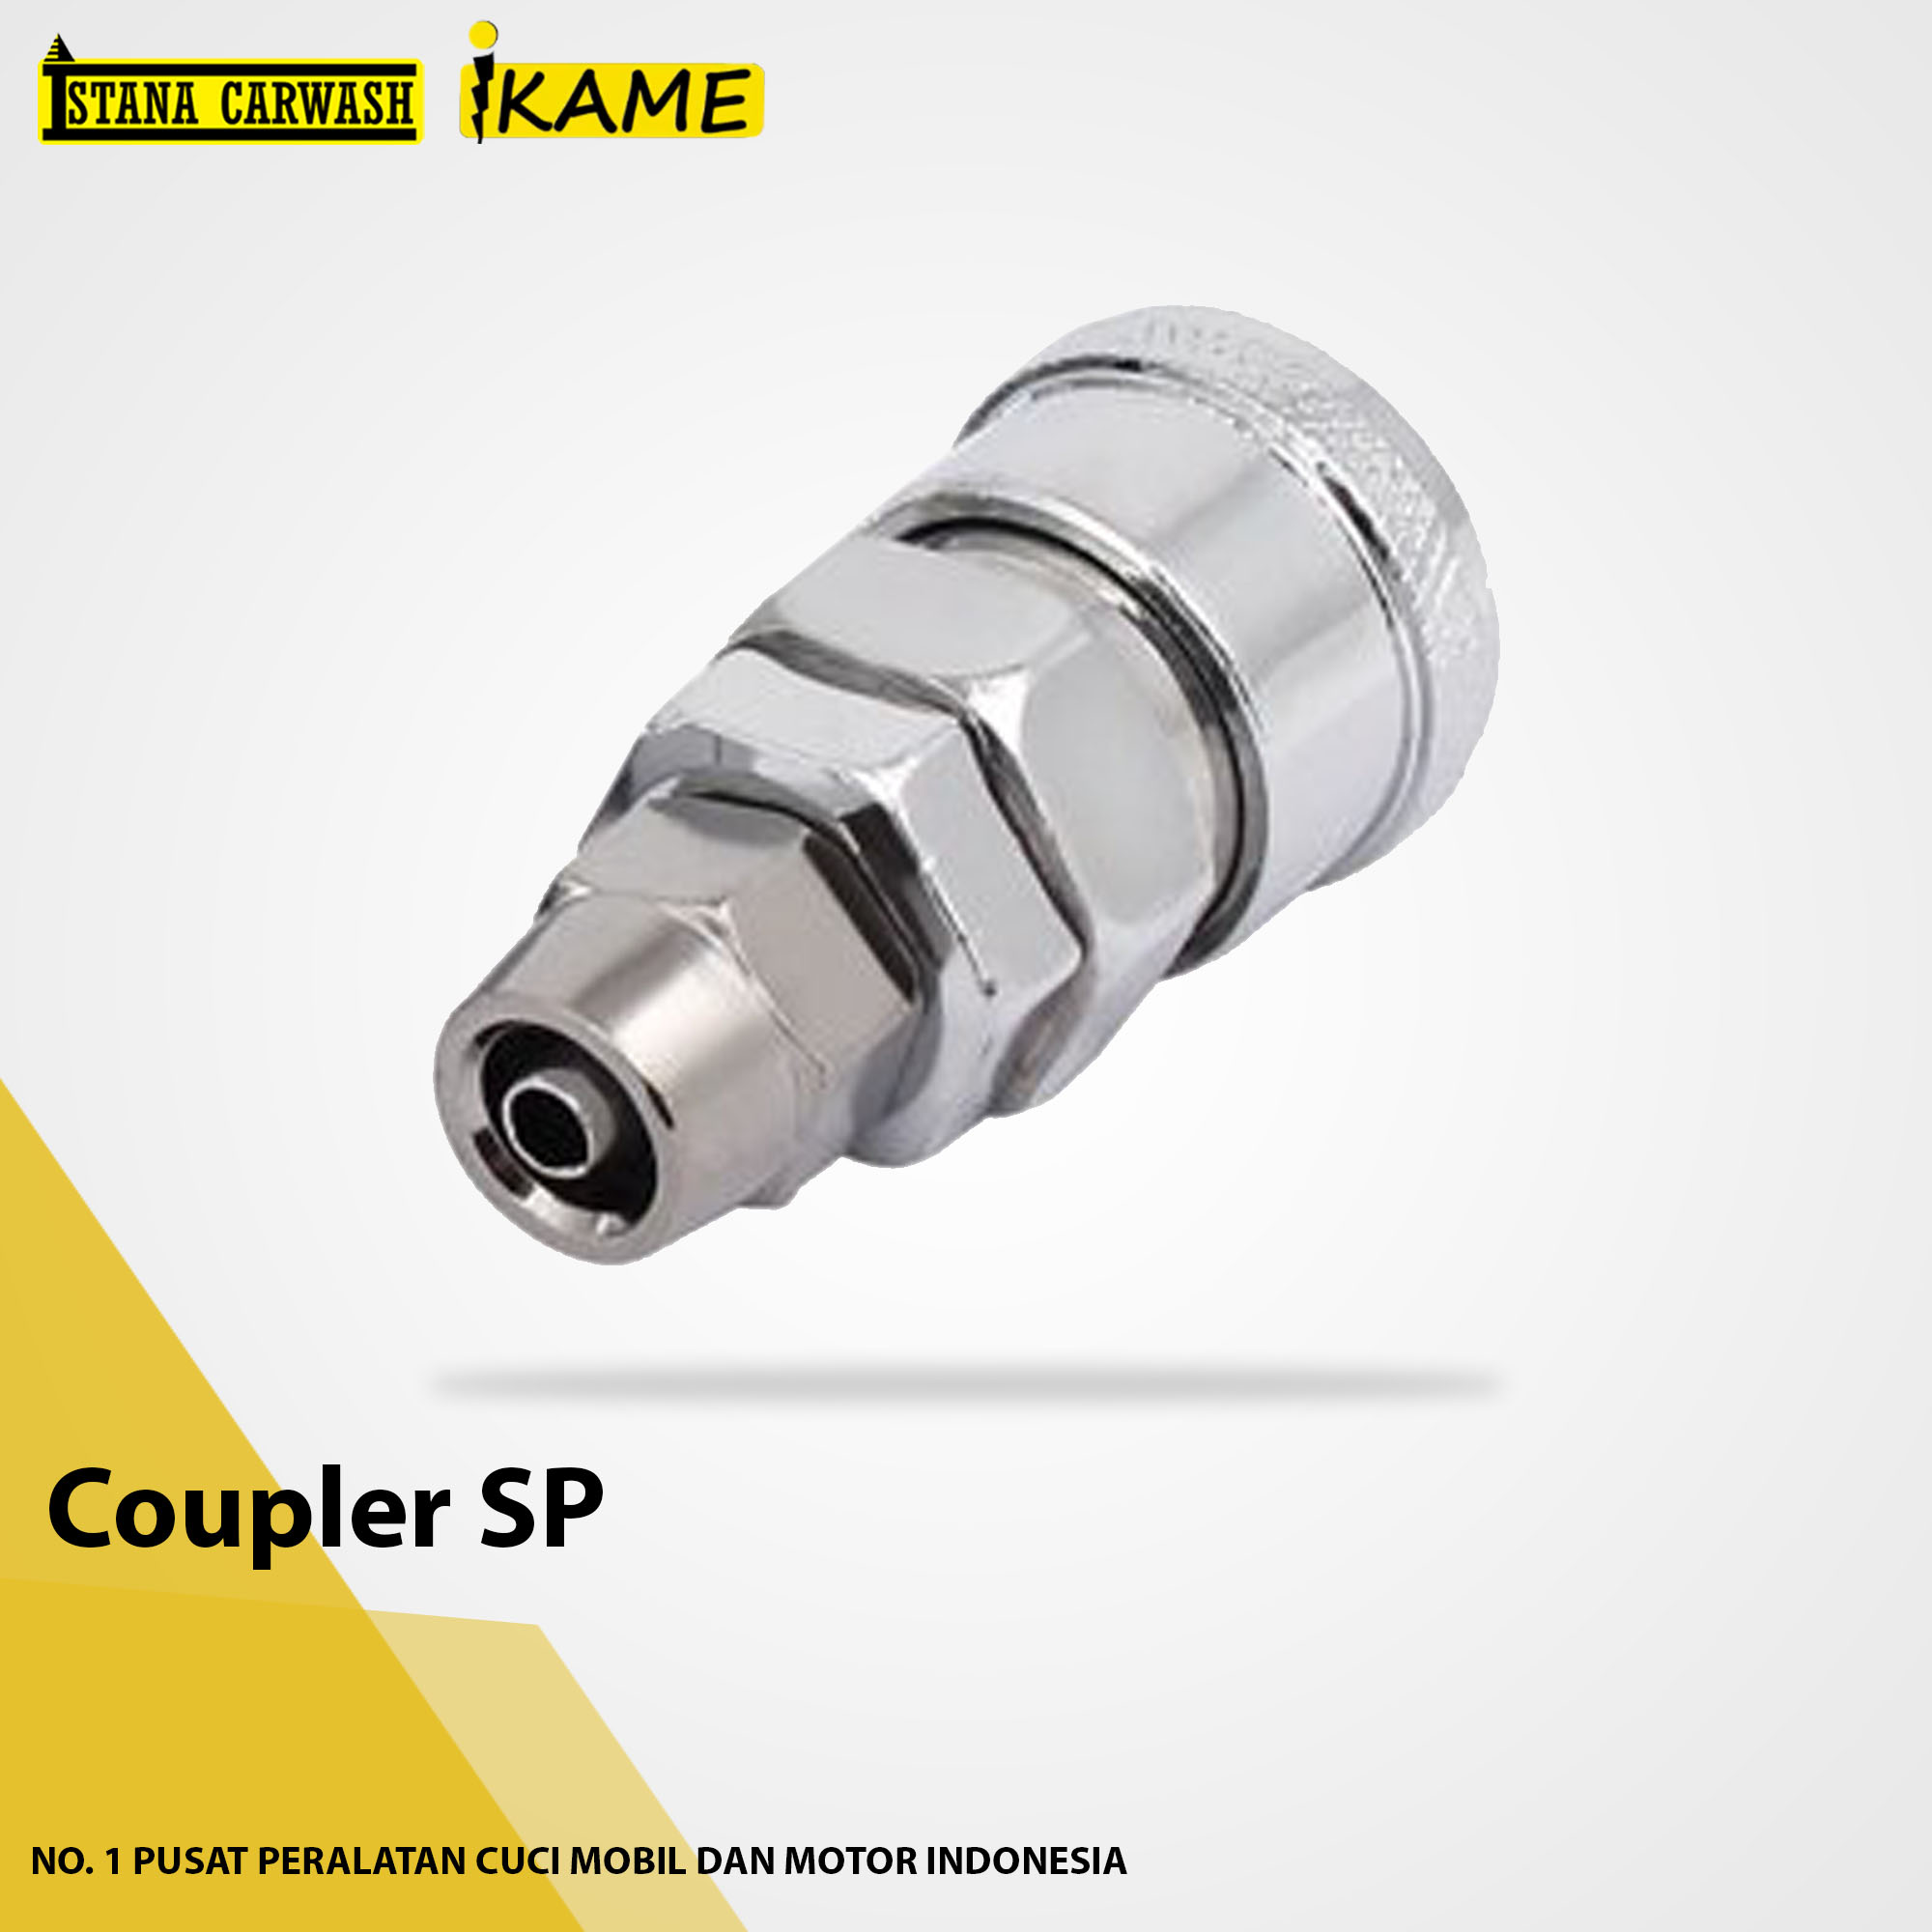 Coupler SP